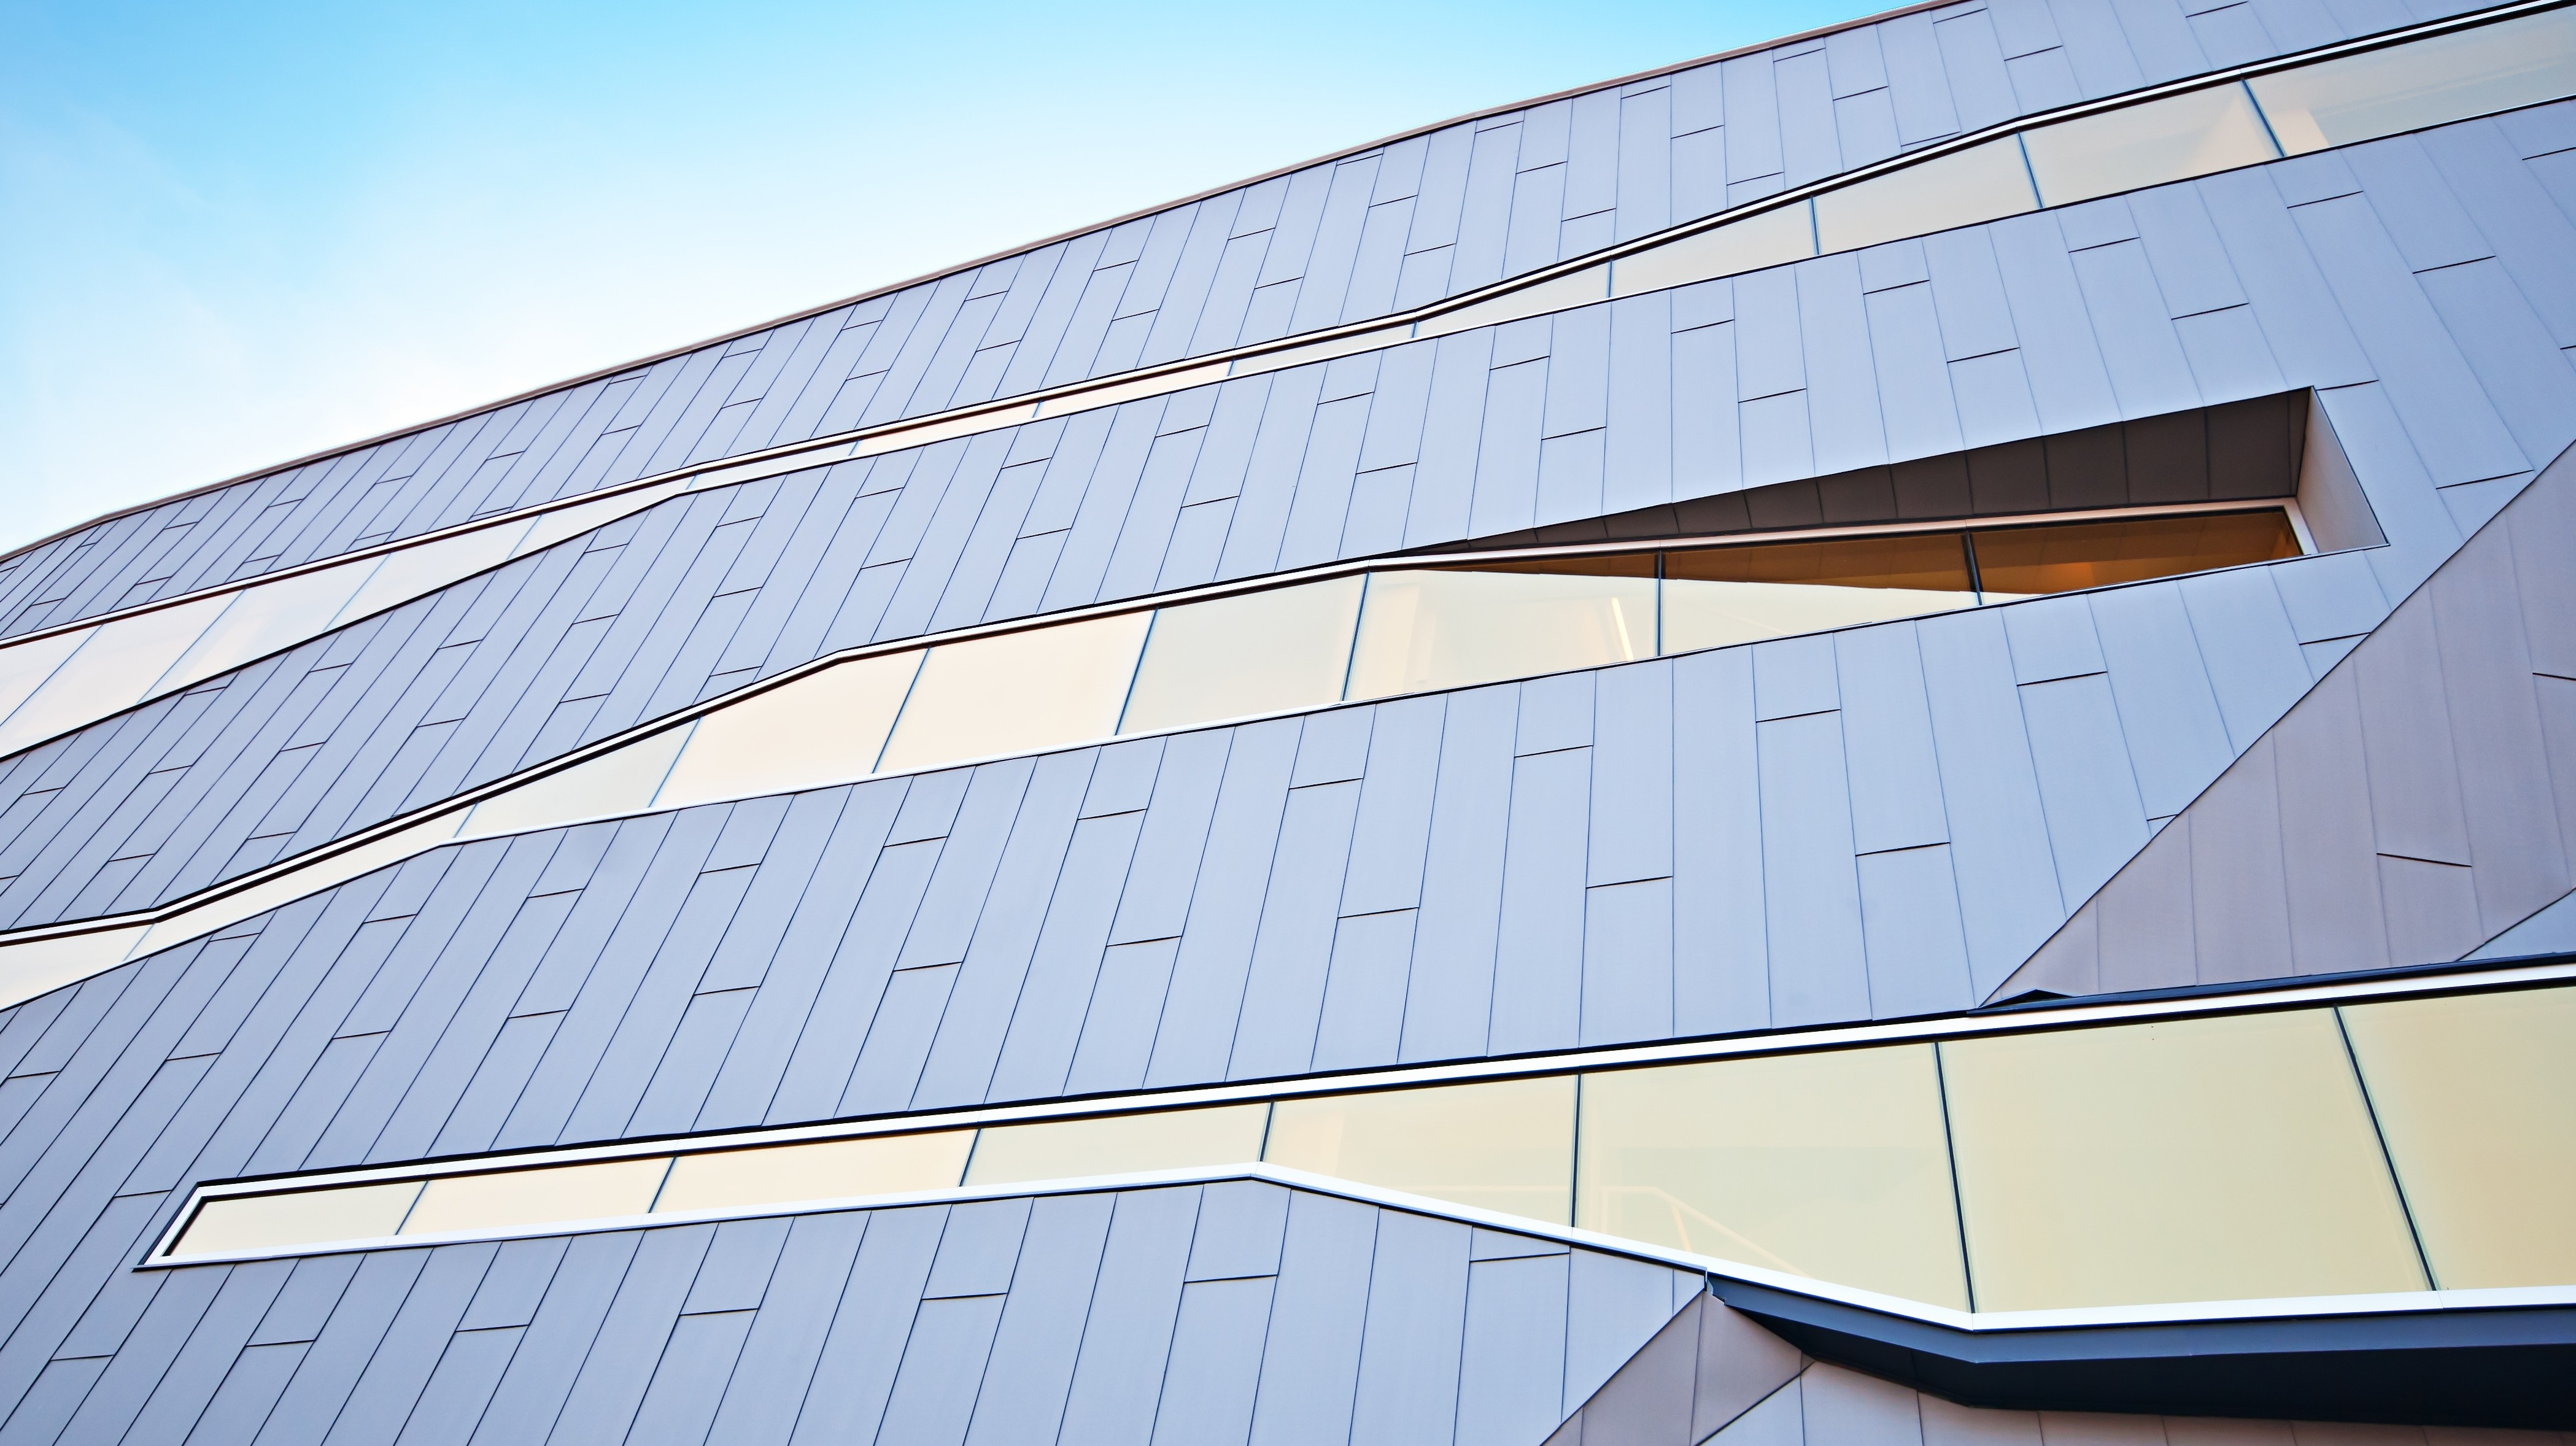 Entenda a diferença entre o vidro cristal, temperado e laminado